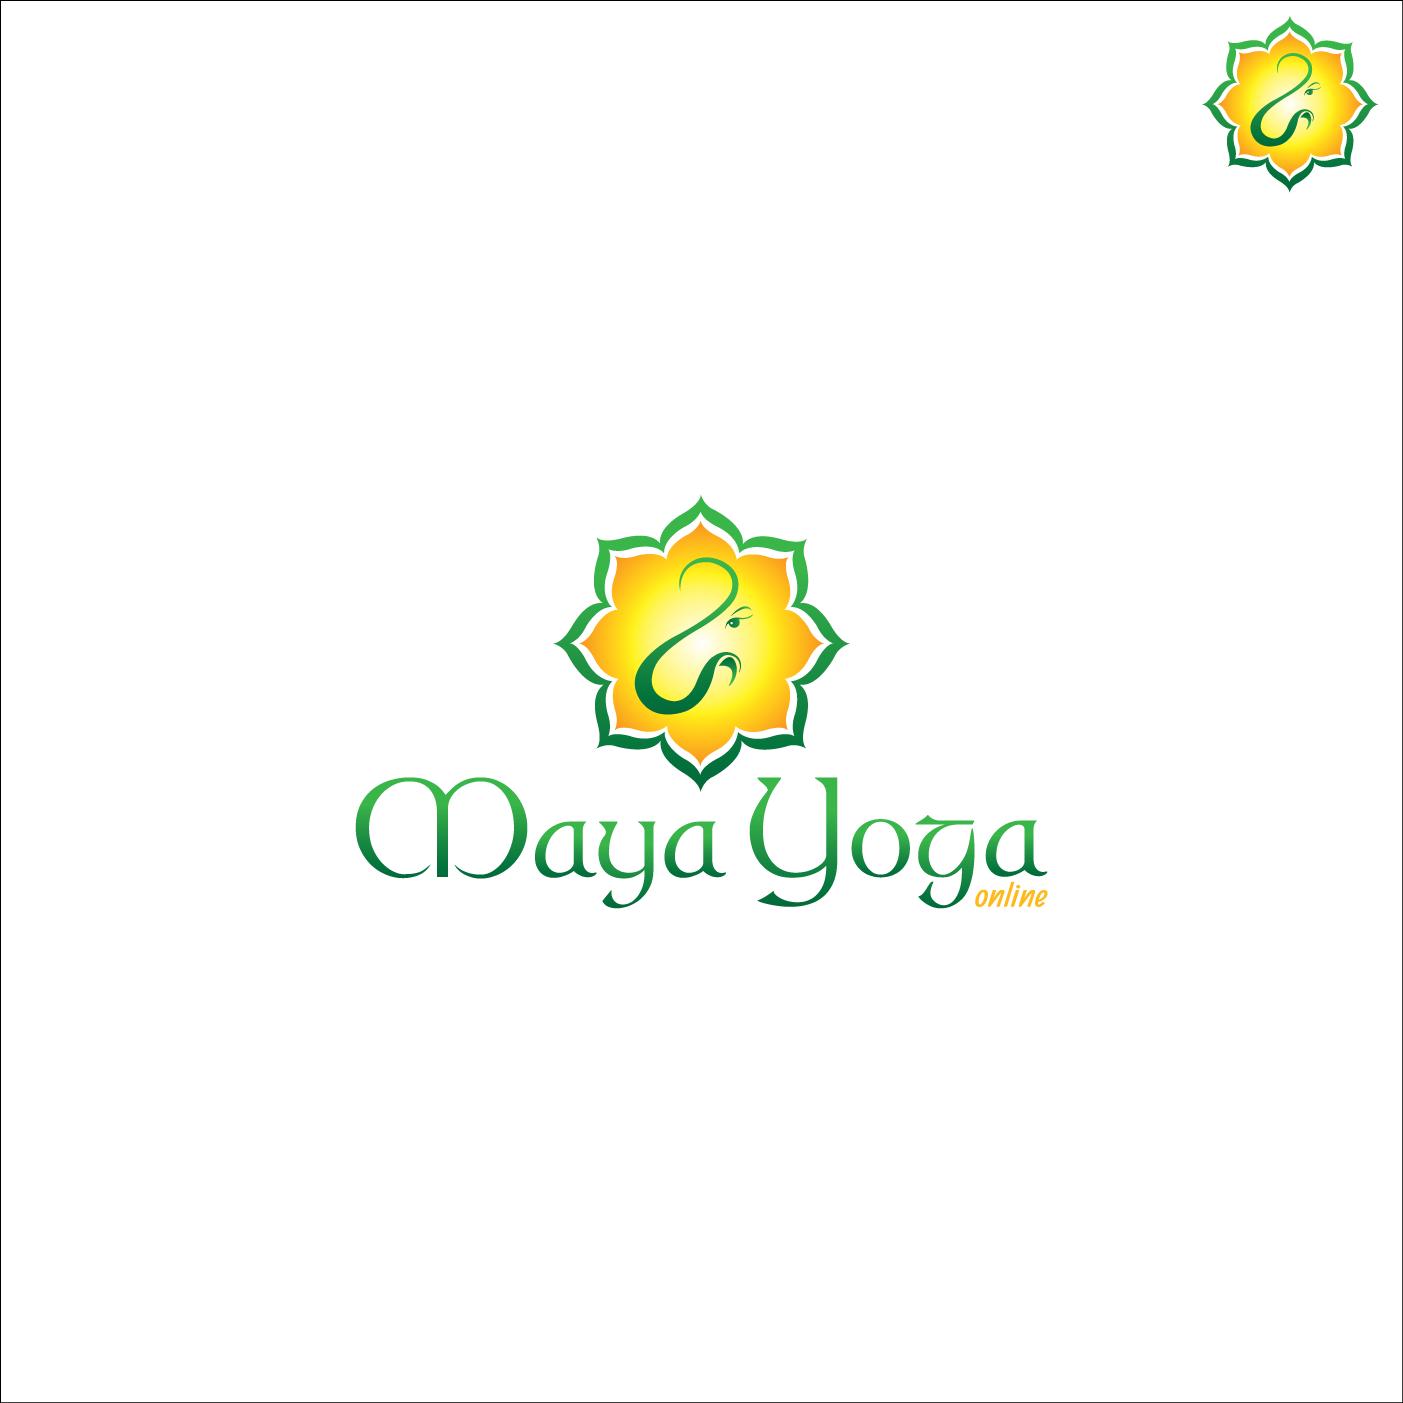 Business Logo Design For Maya Yoga Online By Gauravgraphy Design 2086040